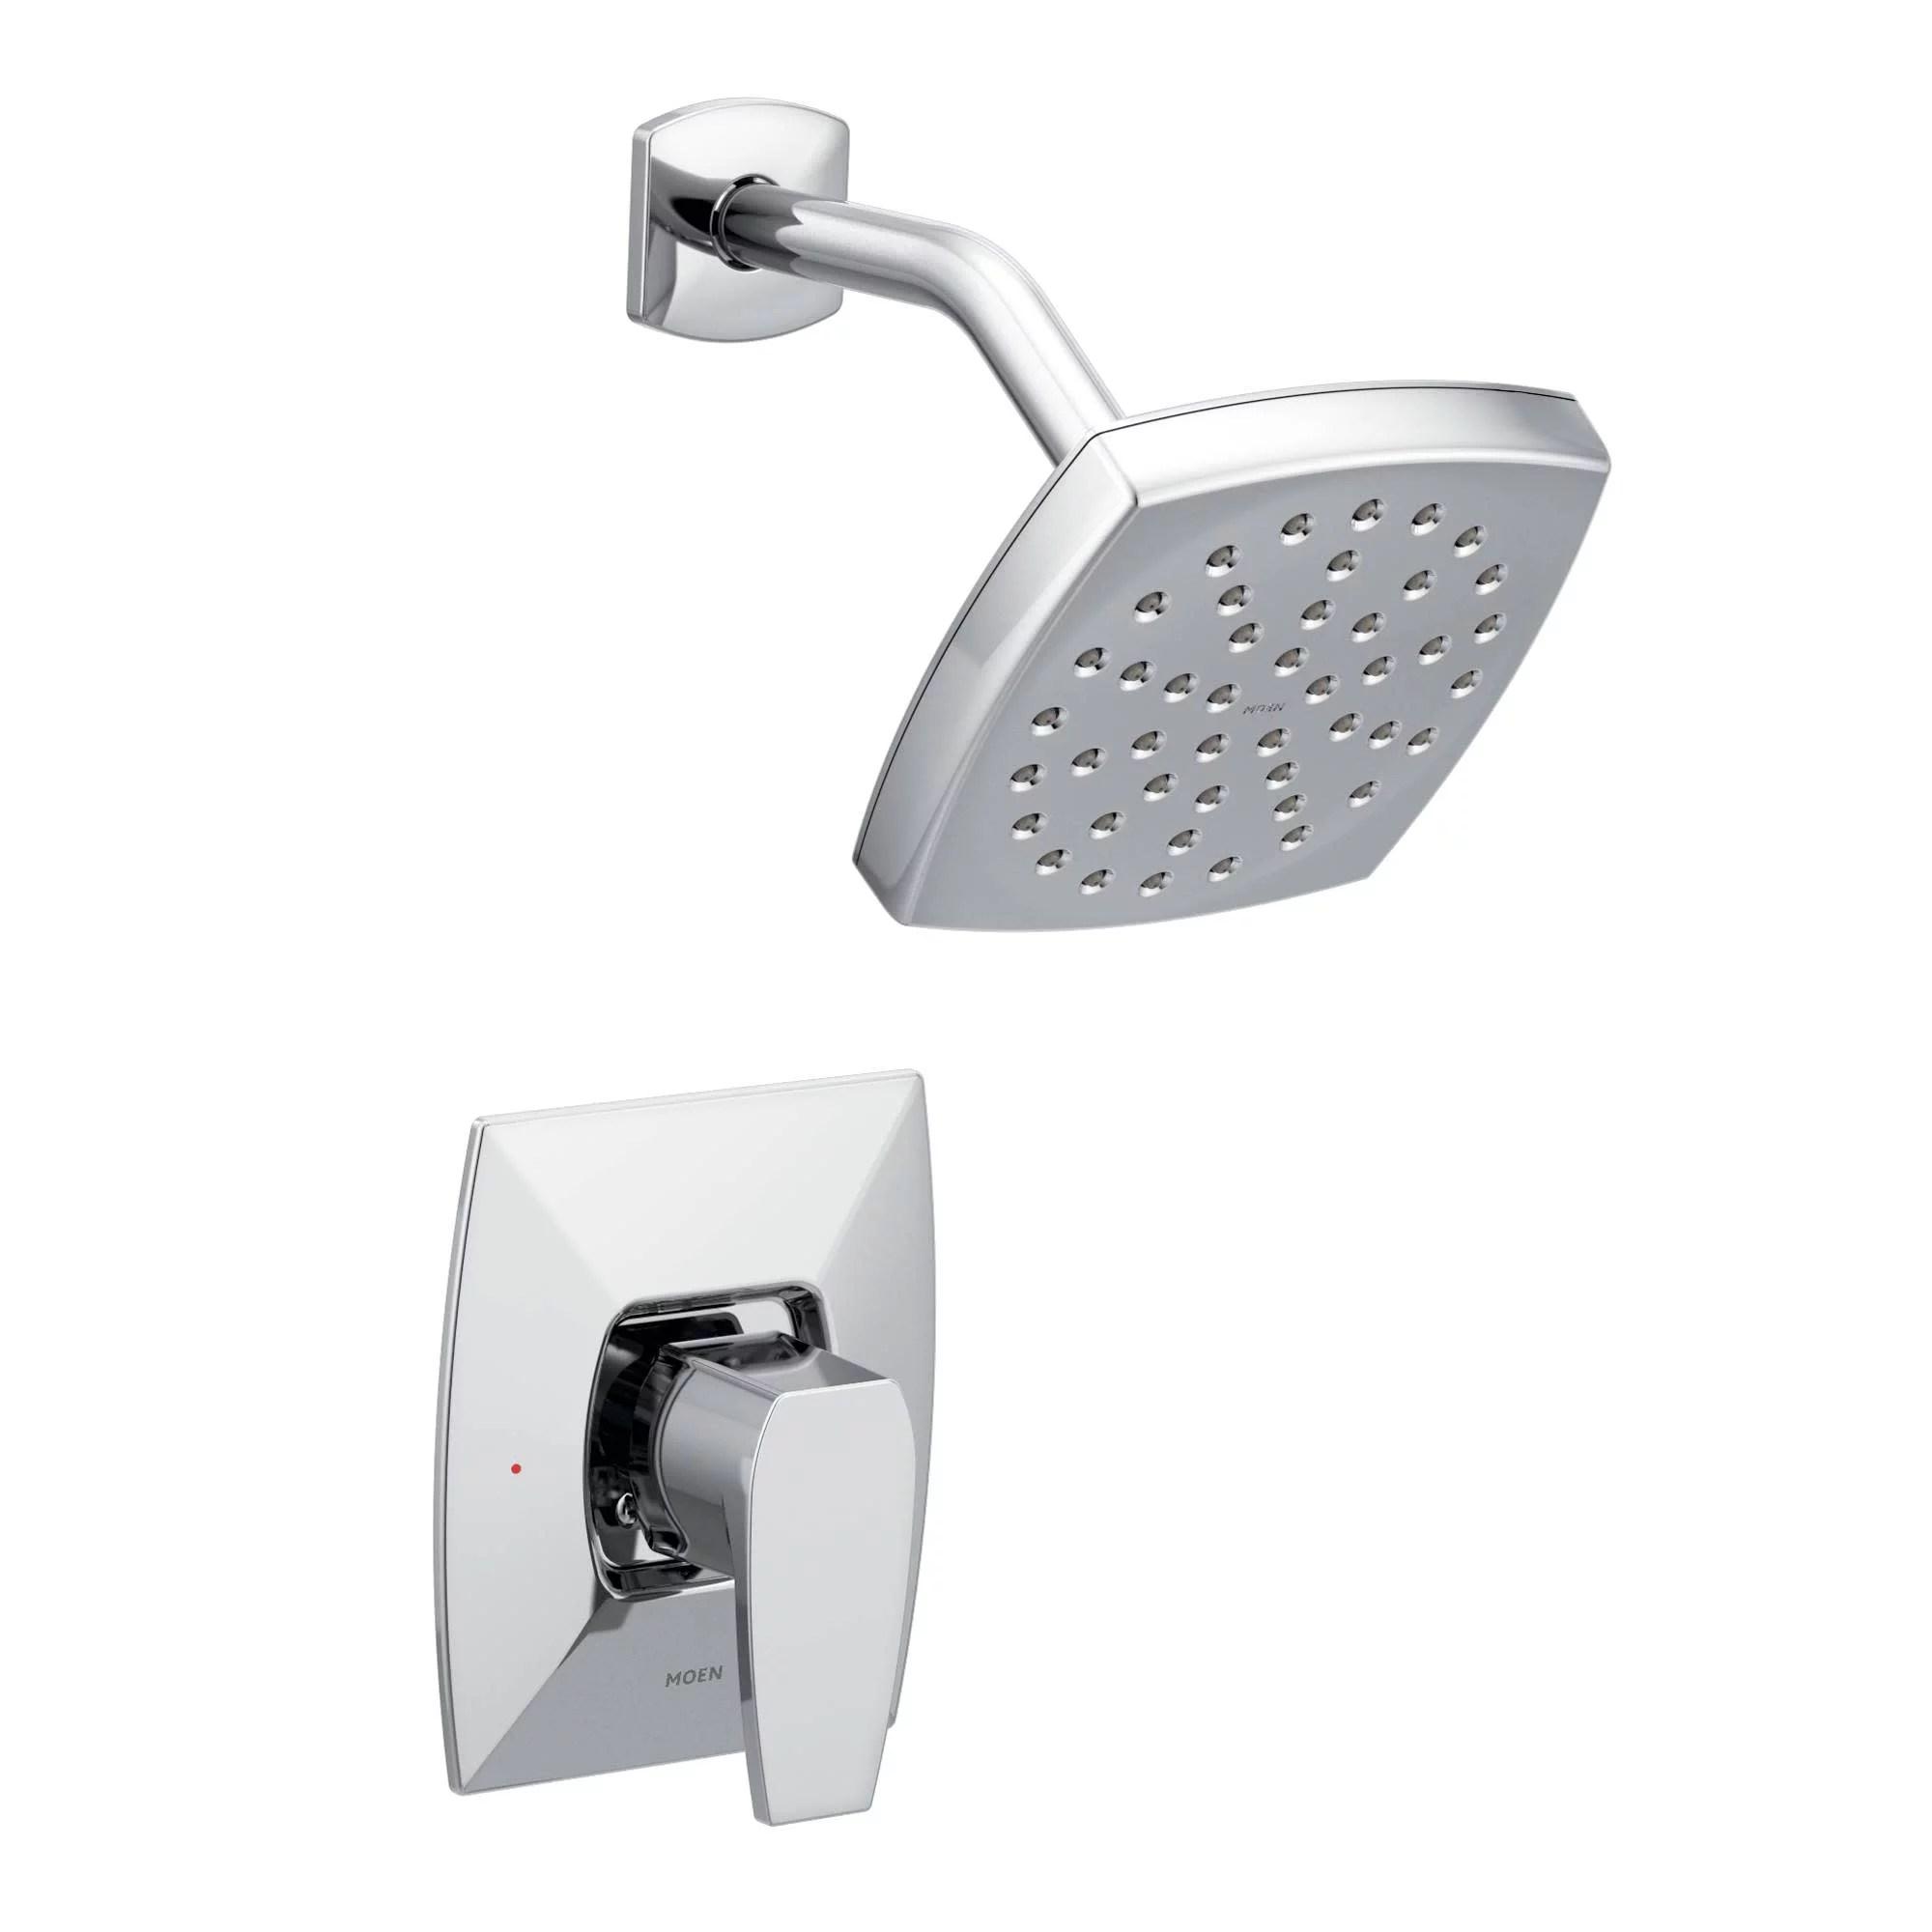 Moen Ts8712ep Via Shower Trim Package With Single Function Rain Shower Head